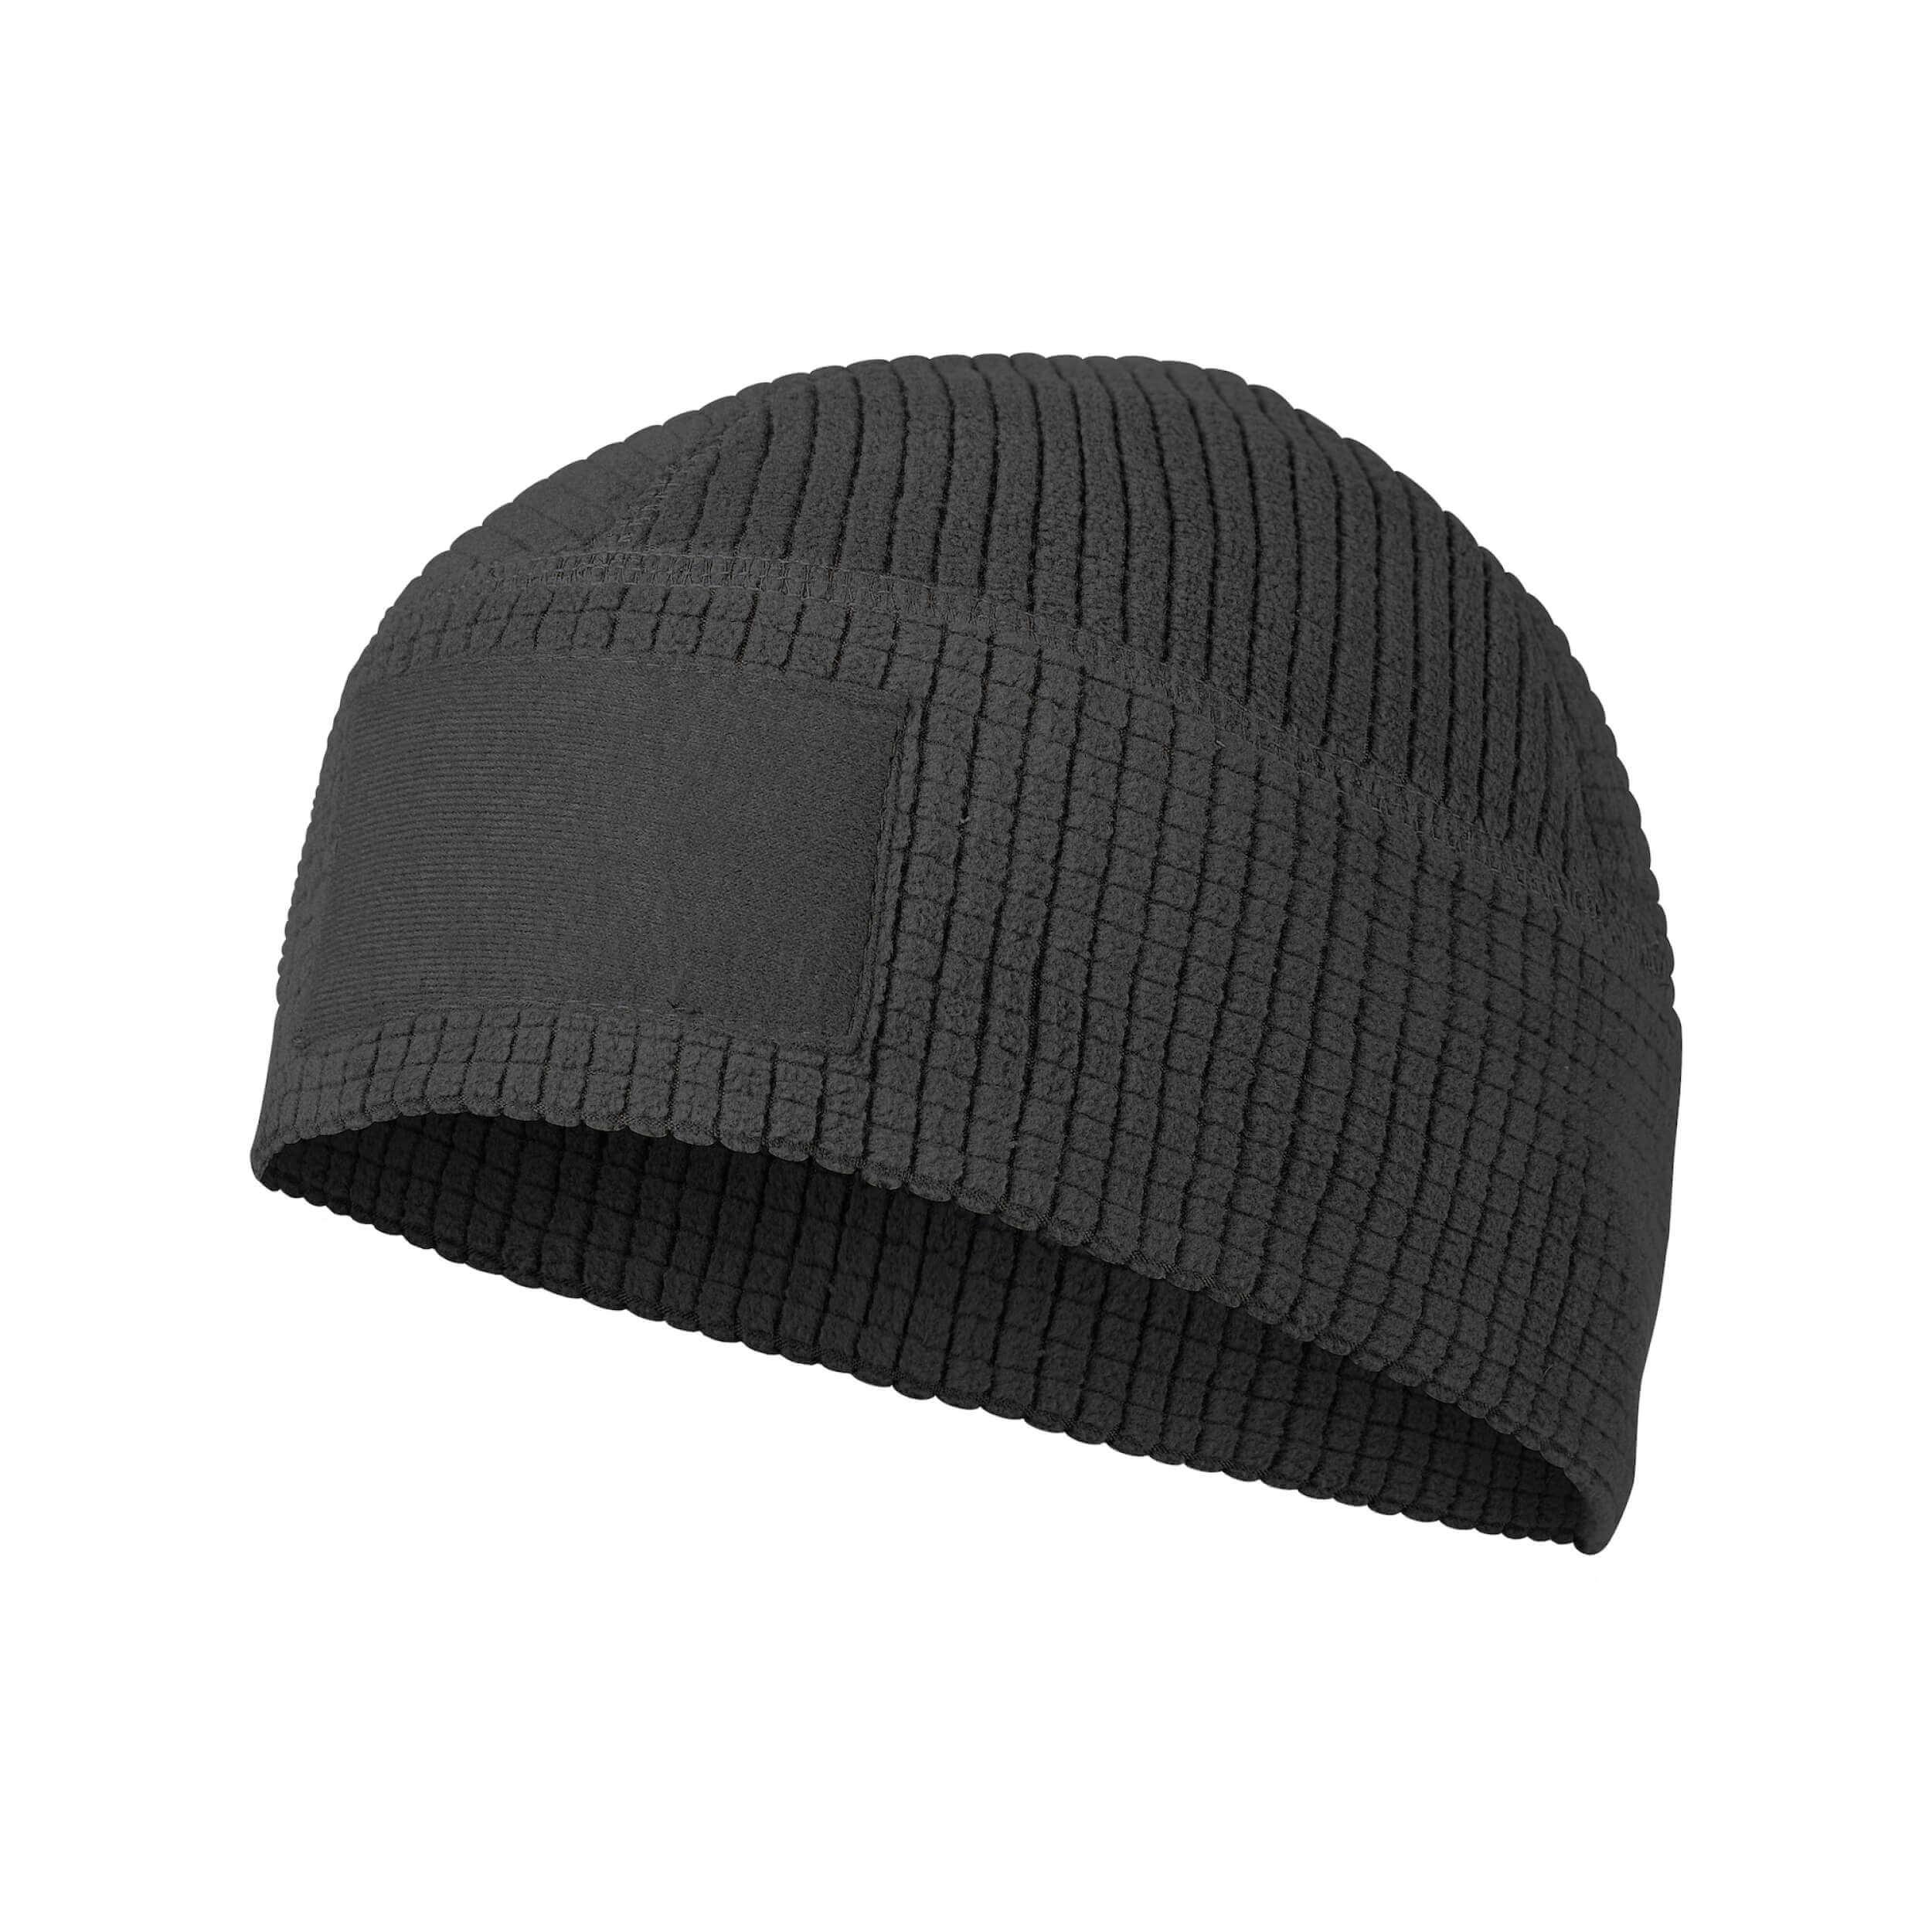 Helikon-Tex Range Beanie Cap - Grid Fleece black